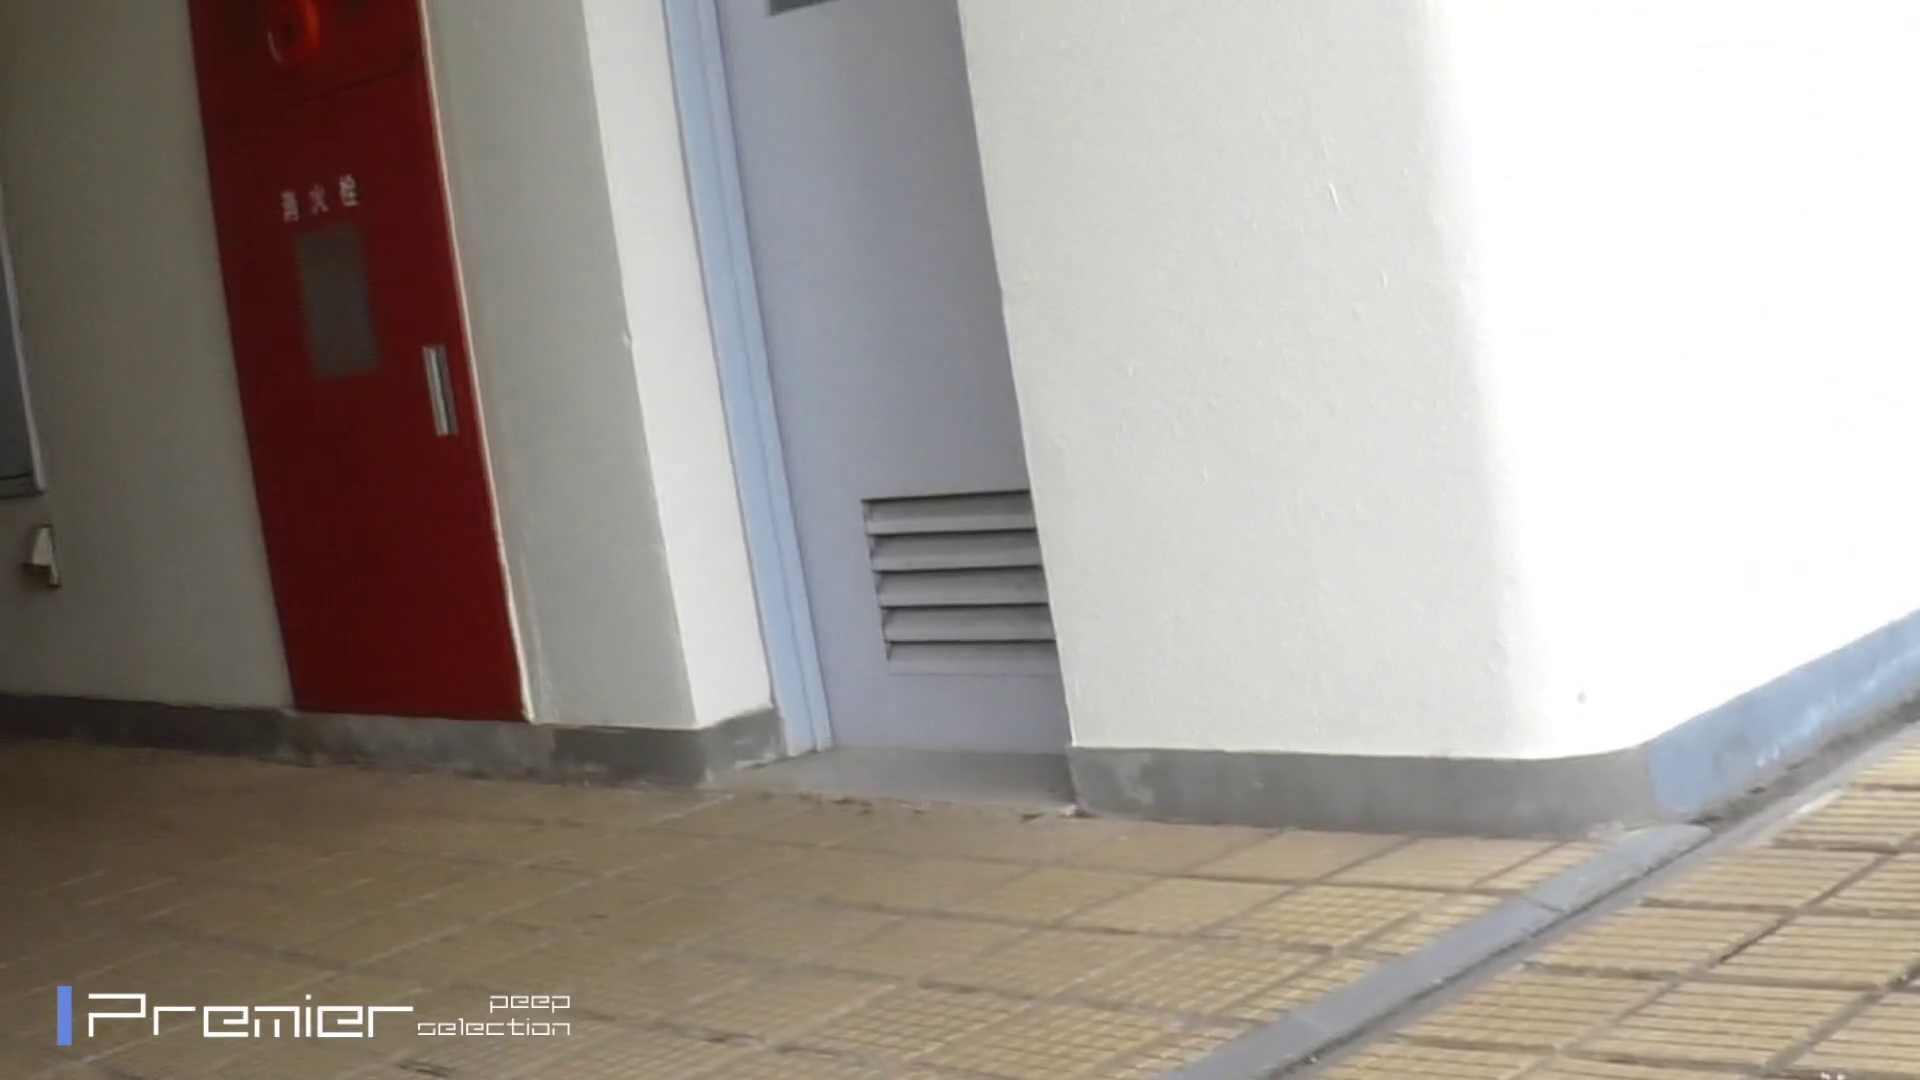 FHD激カワ!激やば! 復讐のトイレ盗撮 Vol.03 名作殿堂  78PIX 29